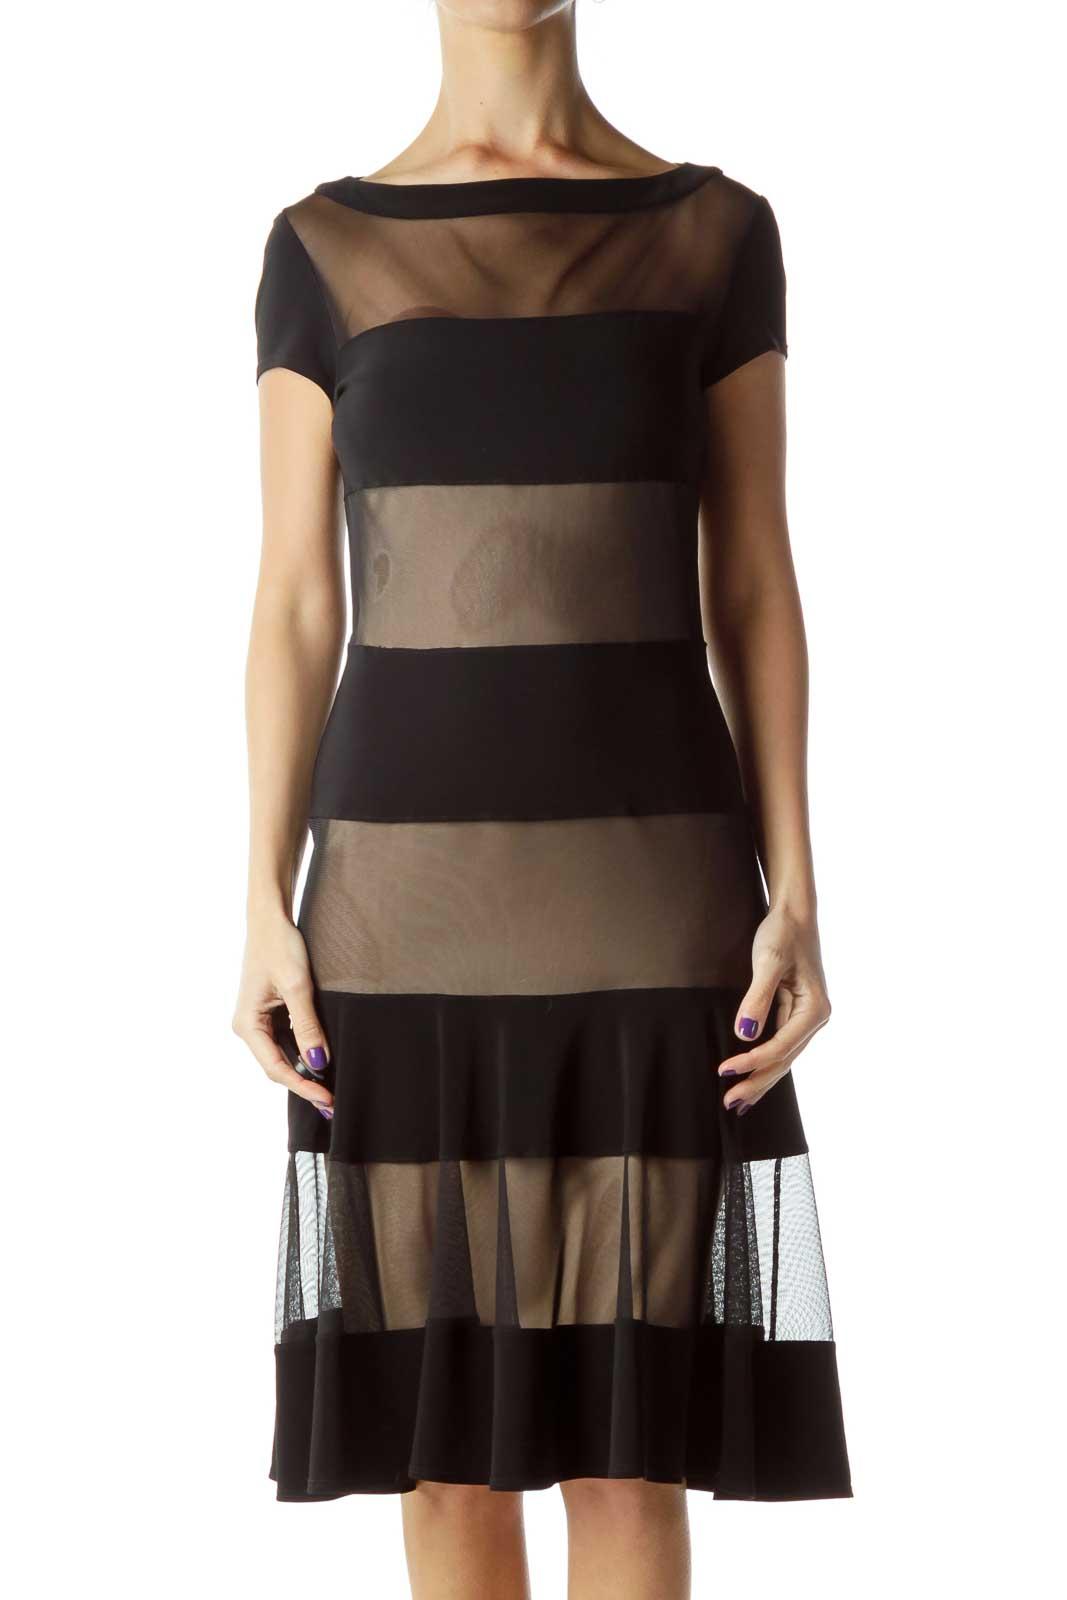 Black Beige Striped Bodycon Dress Front